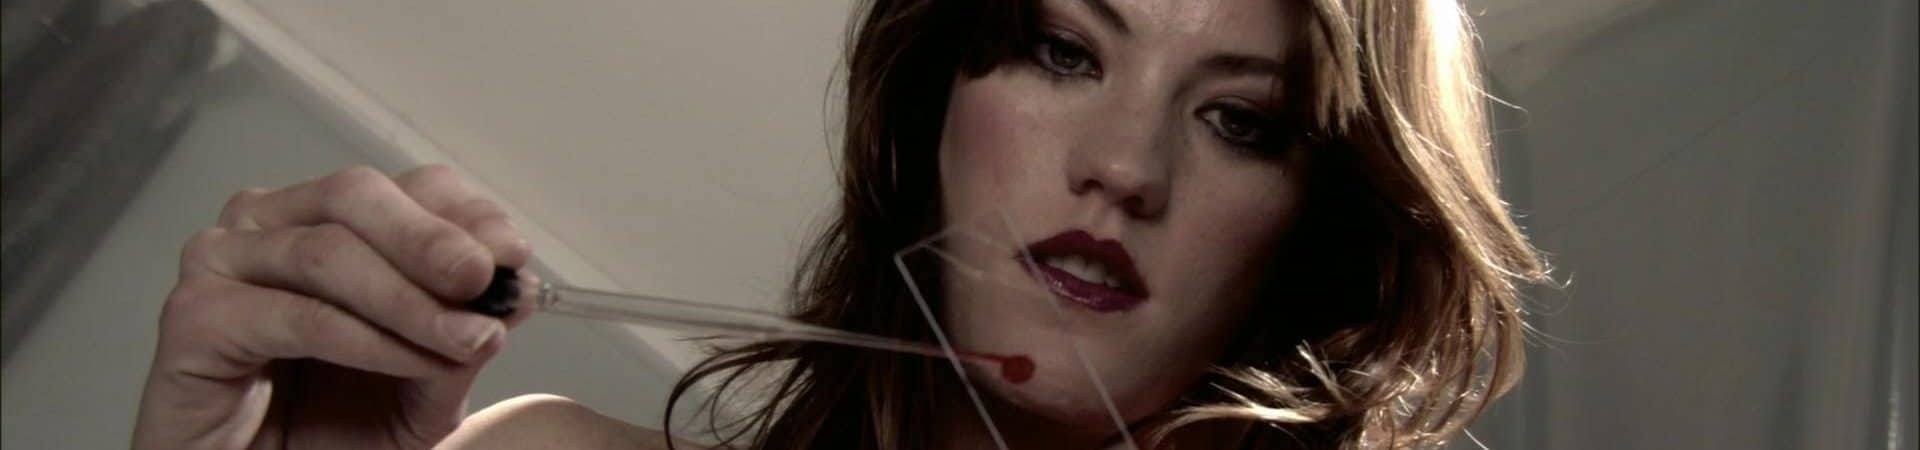 Jennifer Carpenter interpretando Deb Morgan